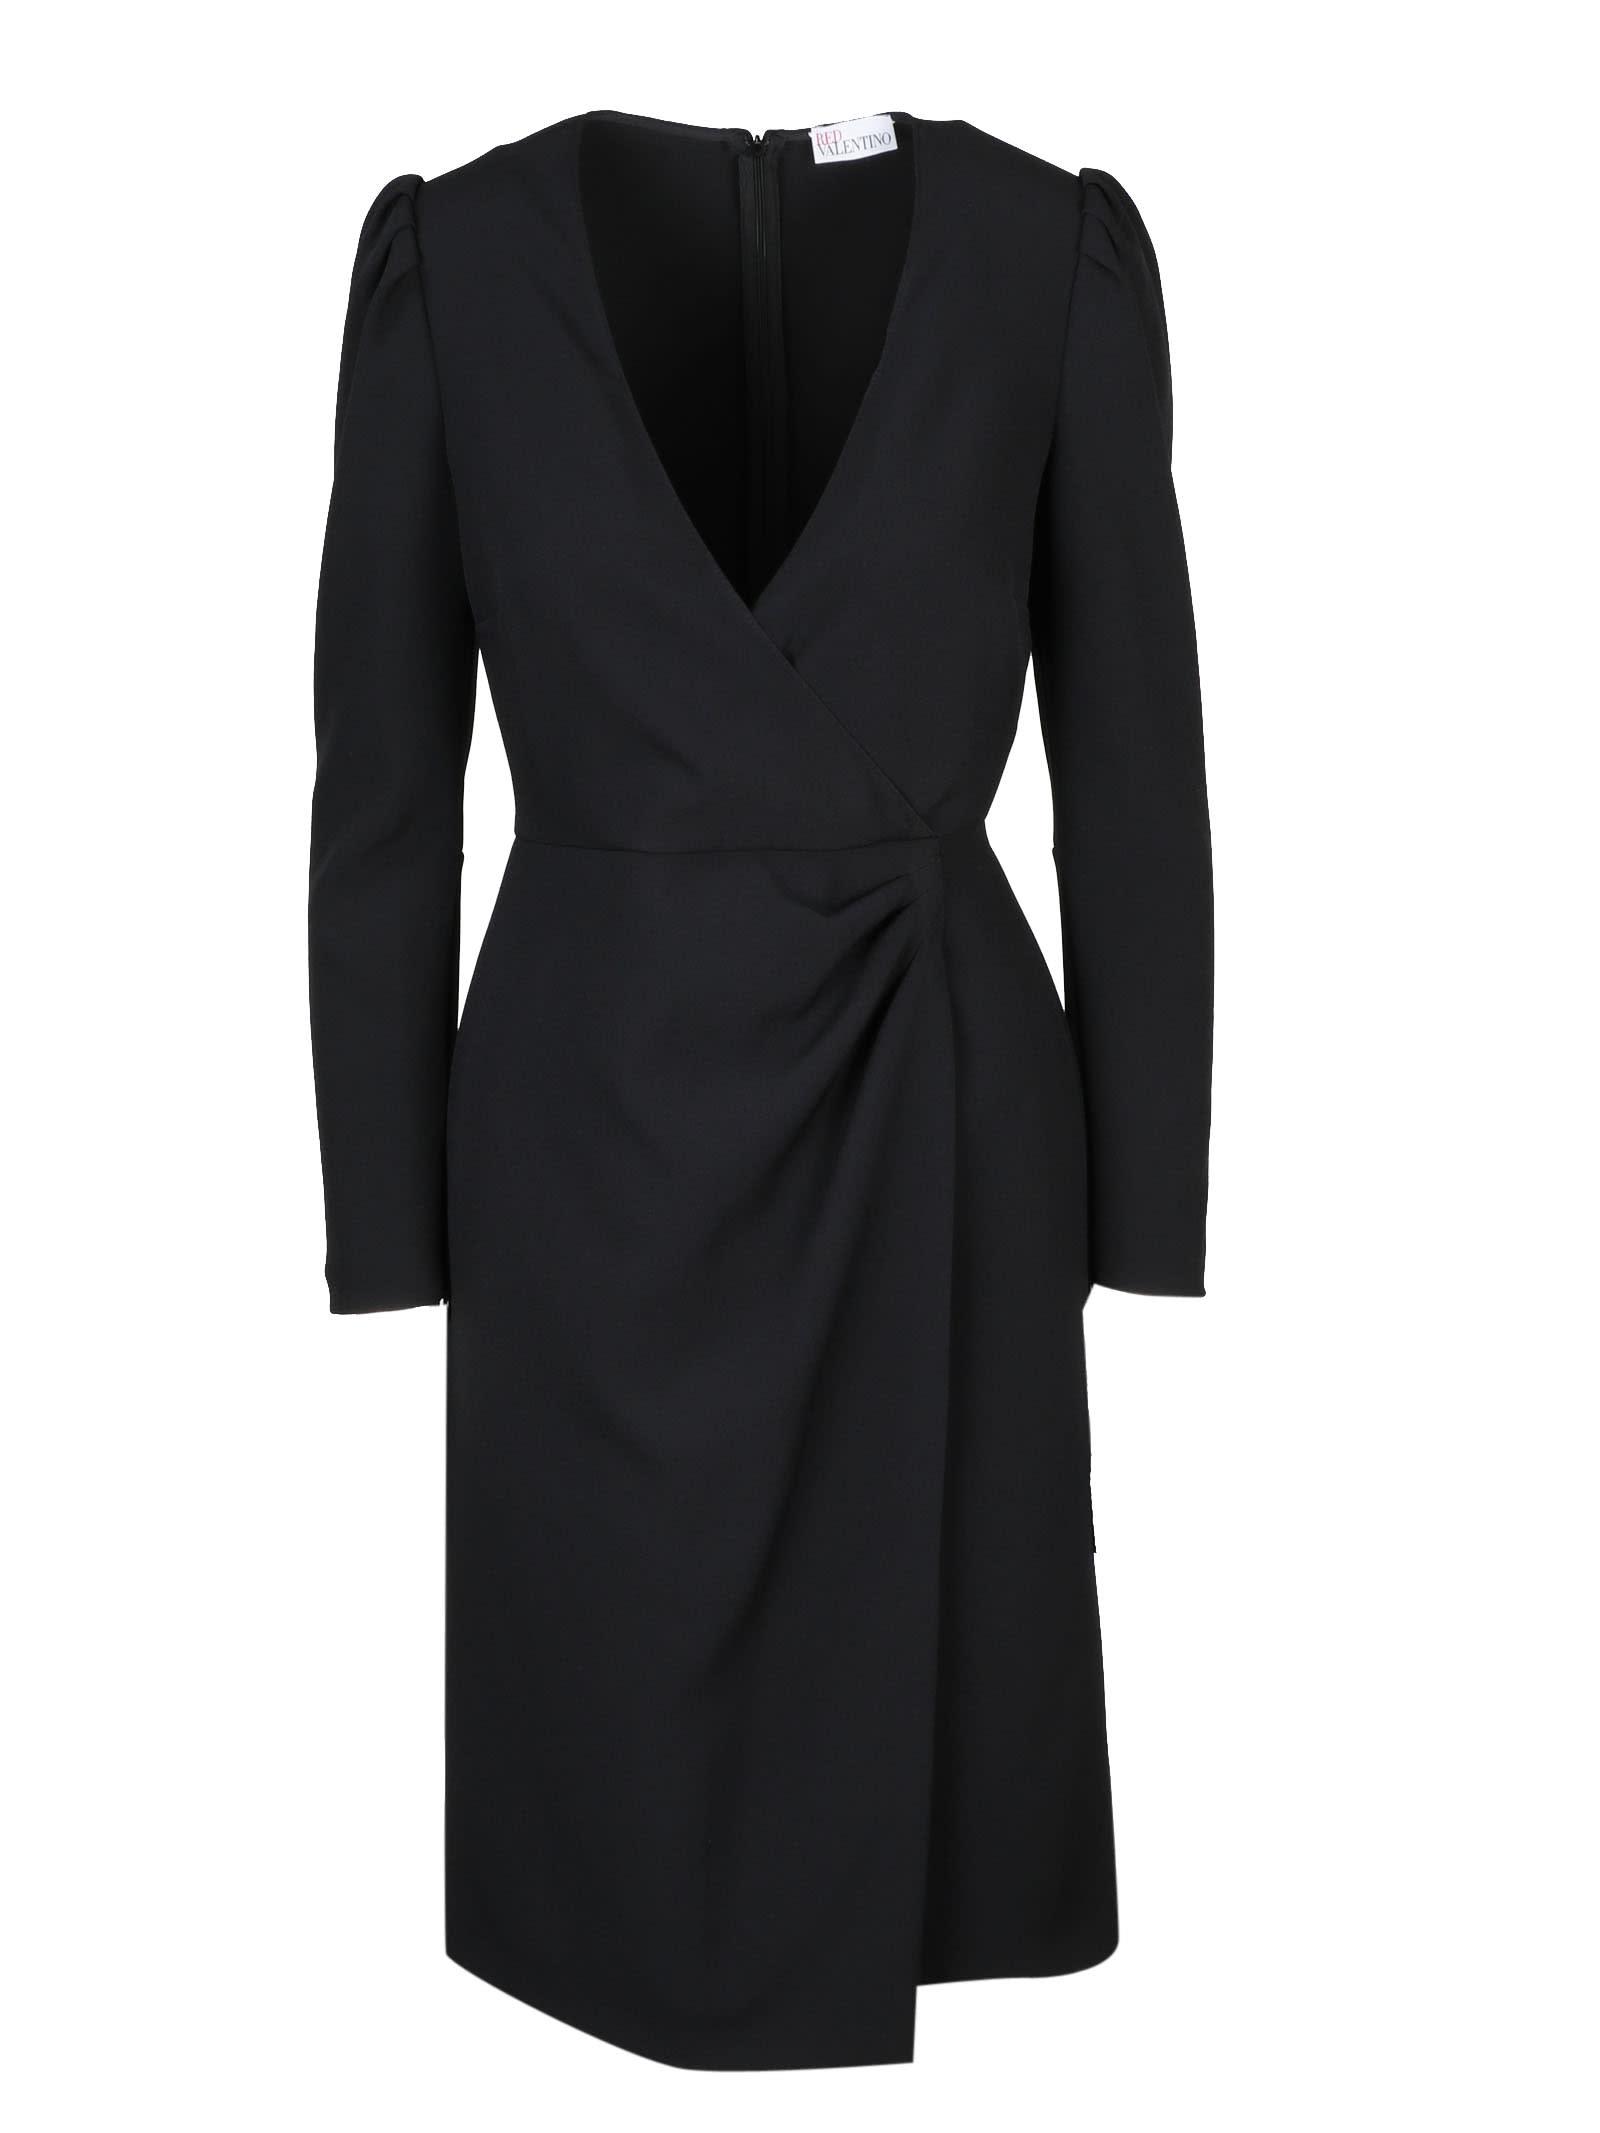 RED Valentino Crepe Stretch Longuette Dress